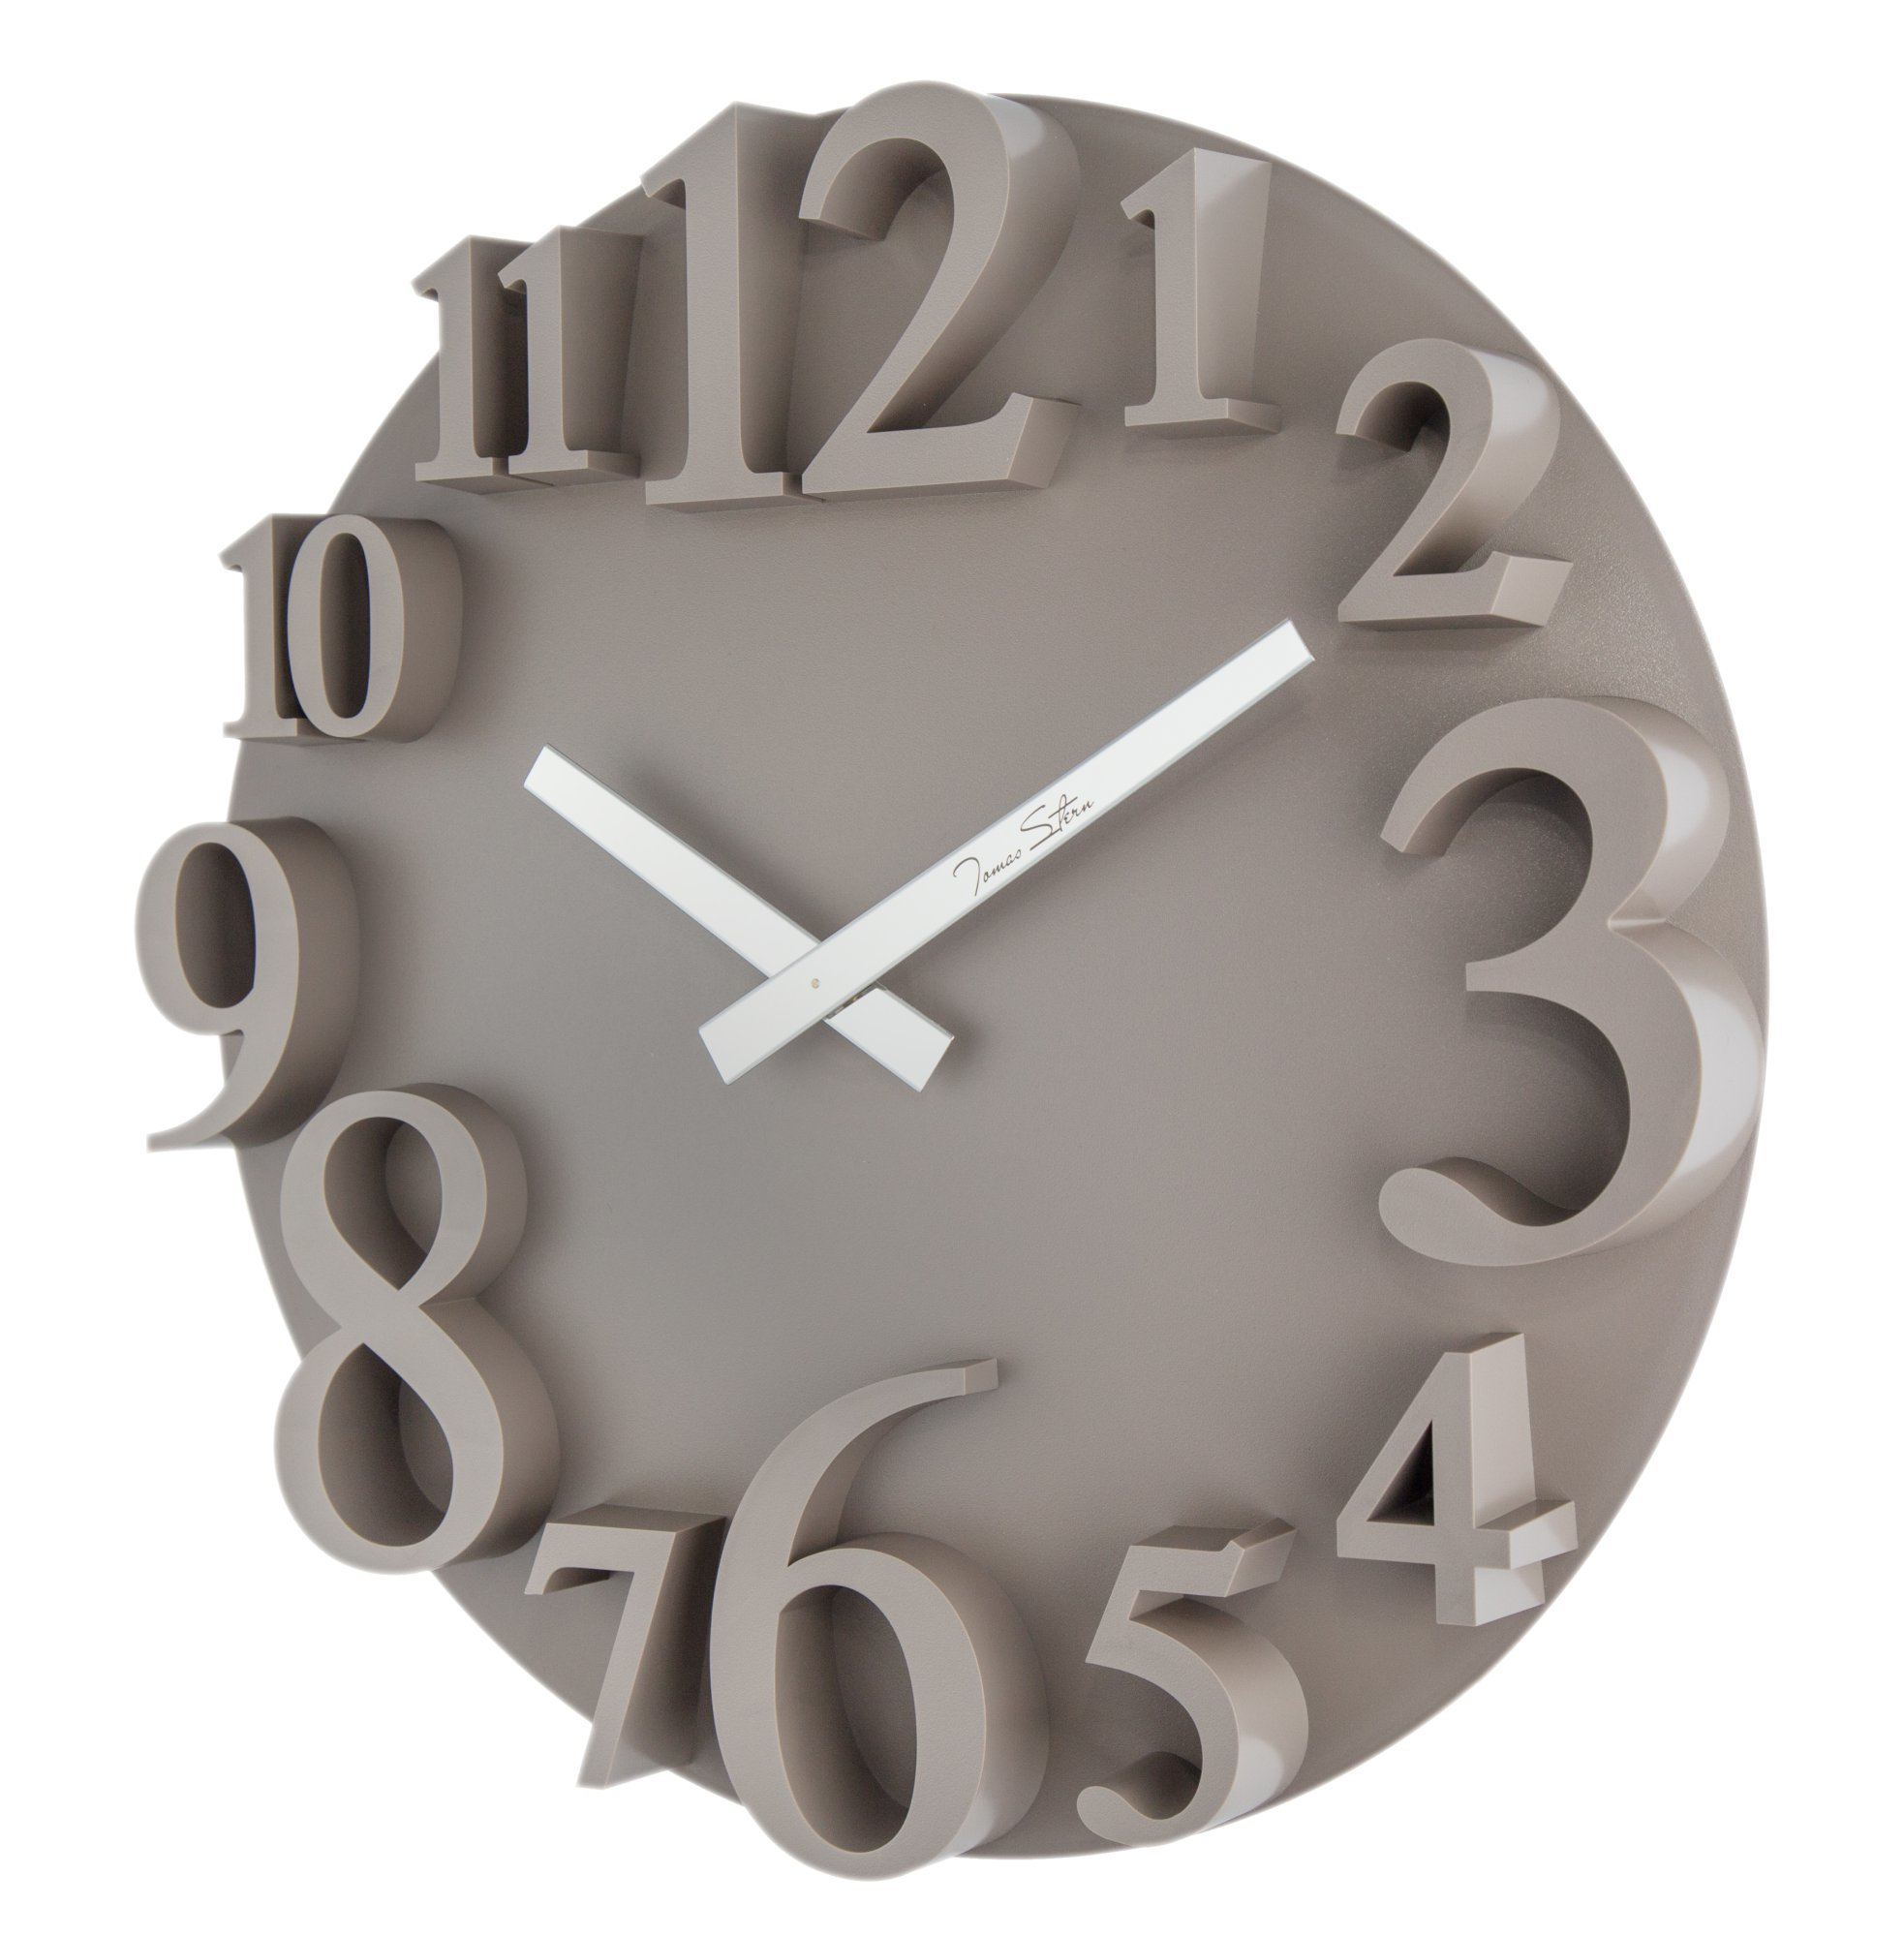 Часы настенные Часы настенные Tomas Stern 4022B chasy-nastennye-tomas-stern-4022b-germaniya.jpg